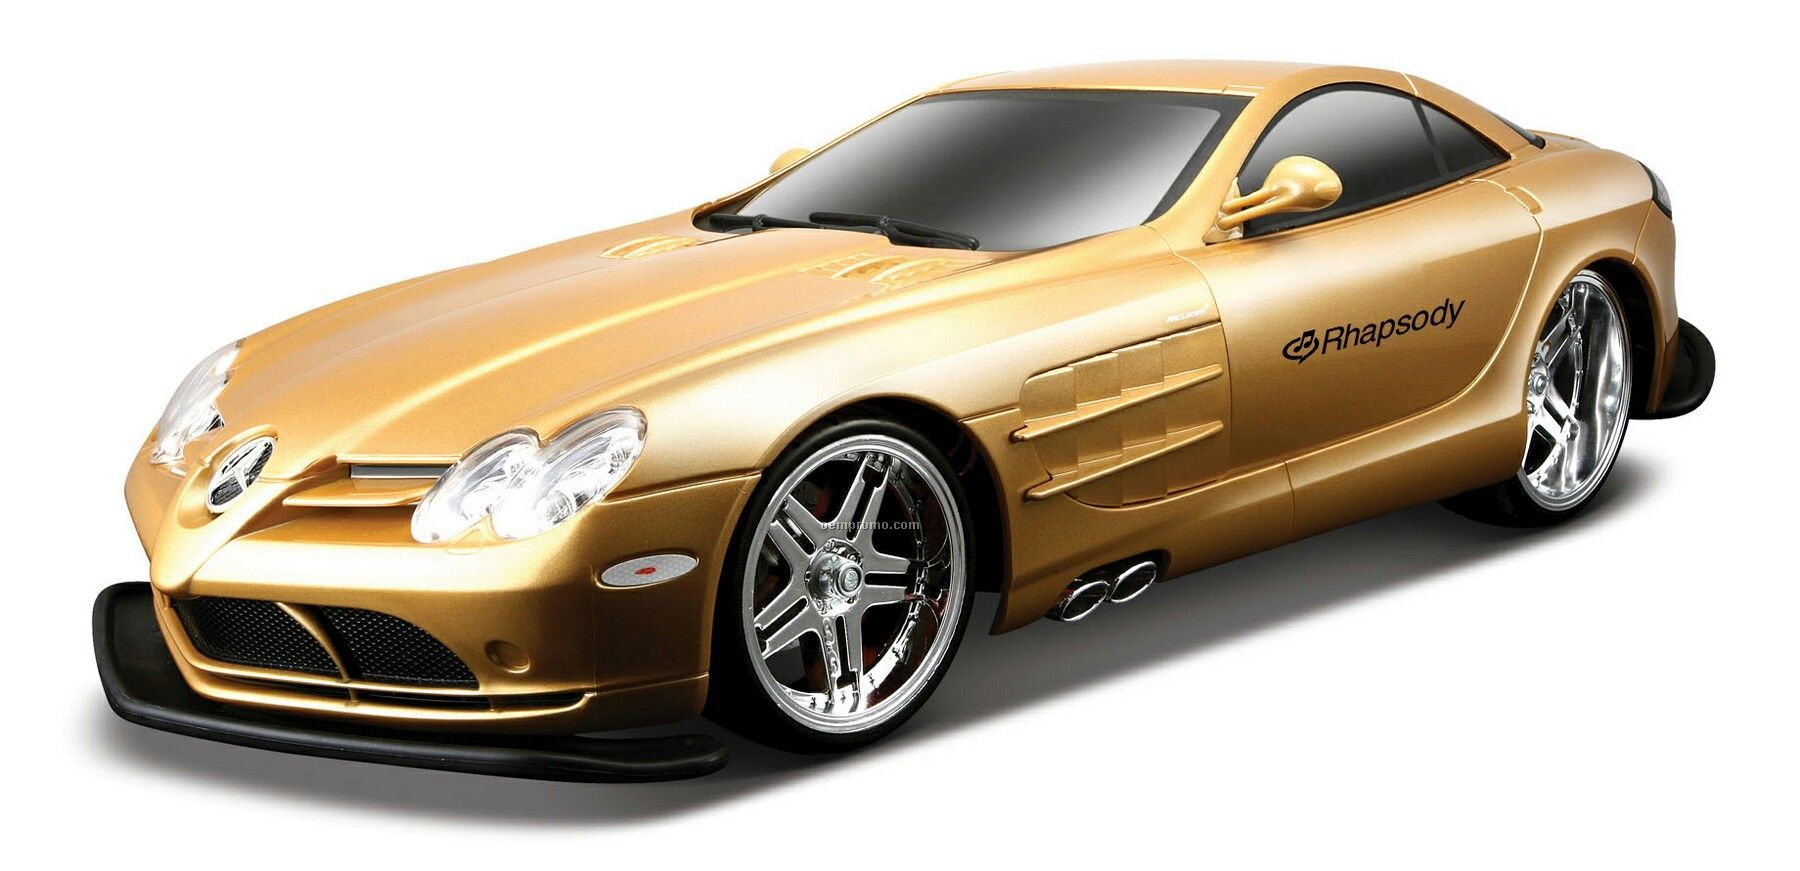 14 r c 1 10 1 12 mercedes benz slr mclaren china for Mercedes benz wholesale